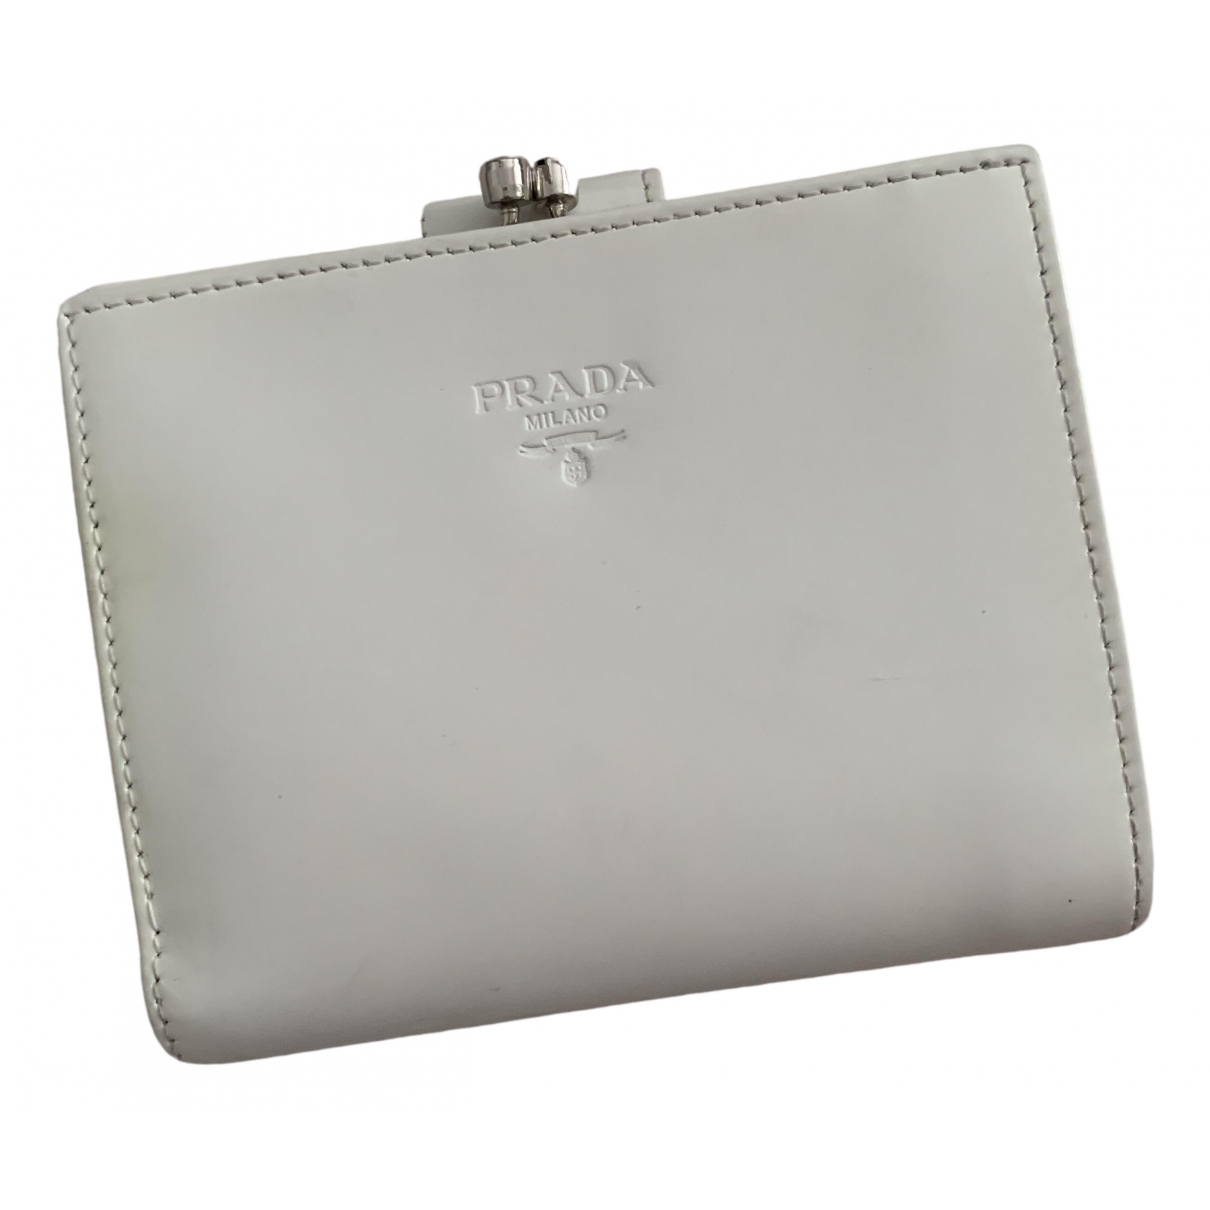 Prada \N White Patent leather wallet for Women \N